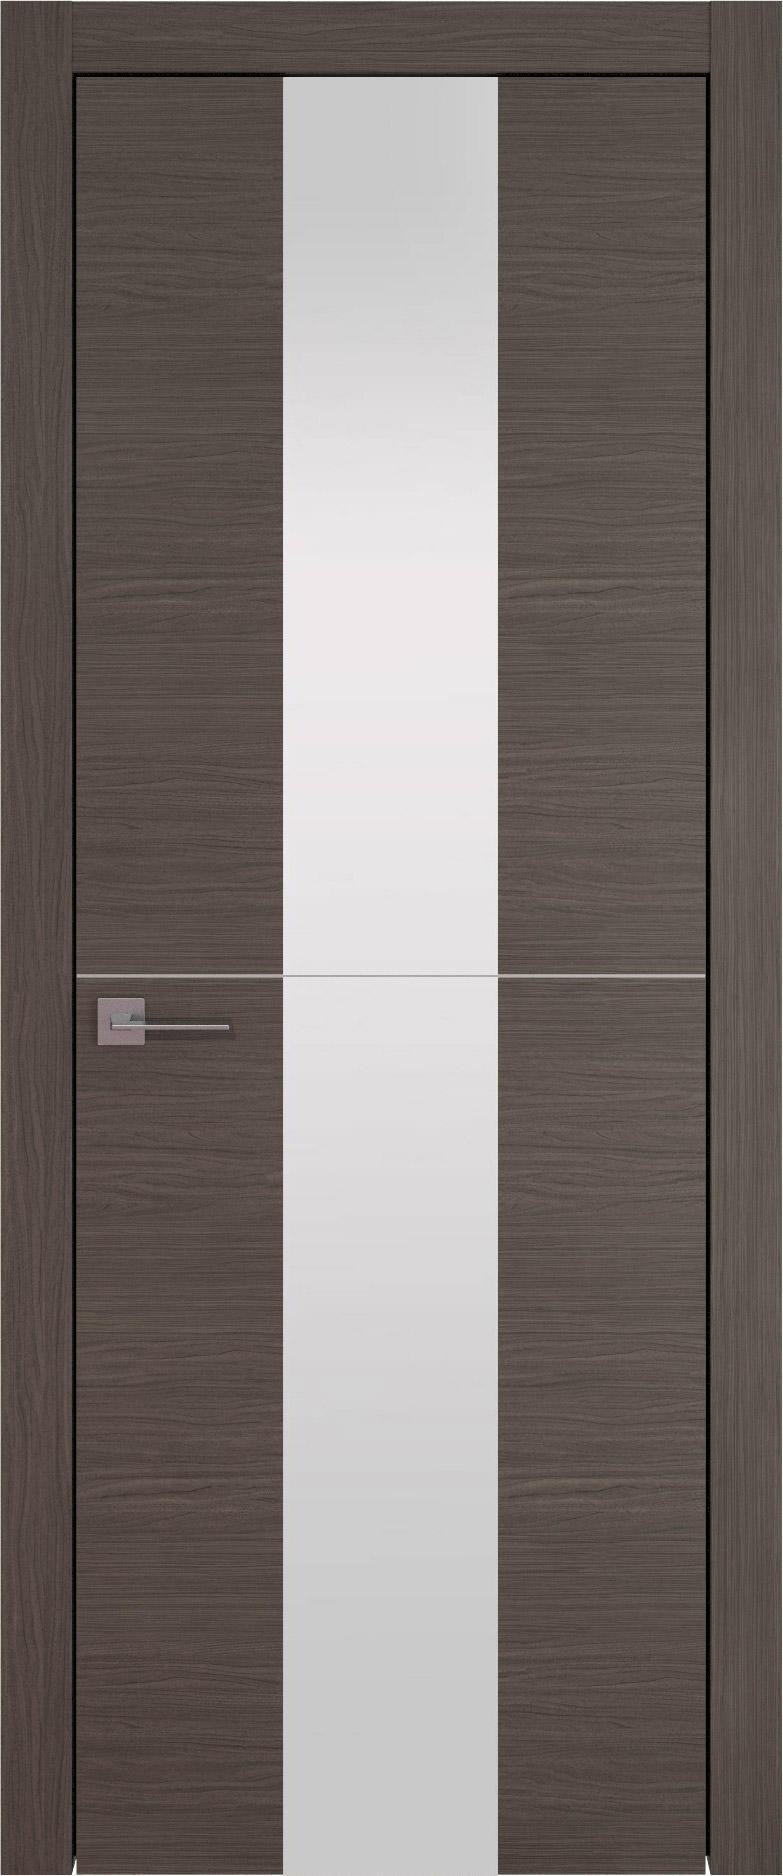 Tivoli Ж-3 цвет - Дуб графит Со стеклом (ДО)